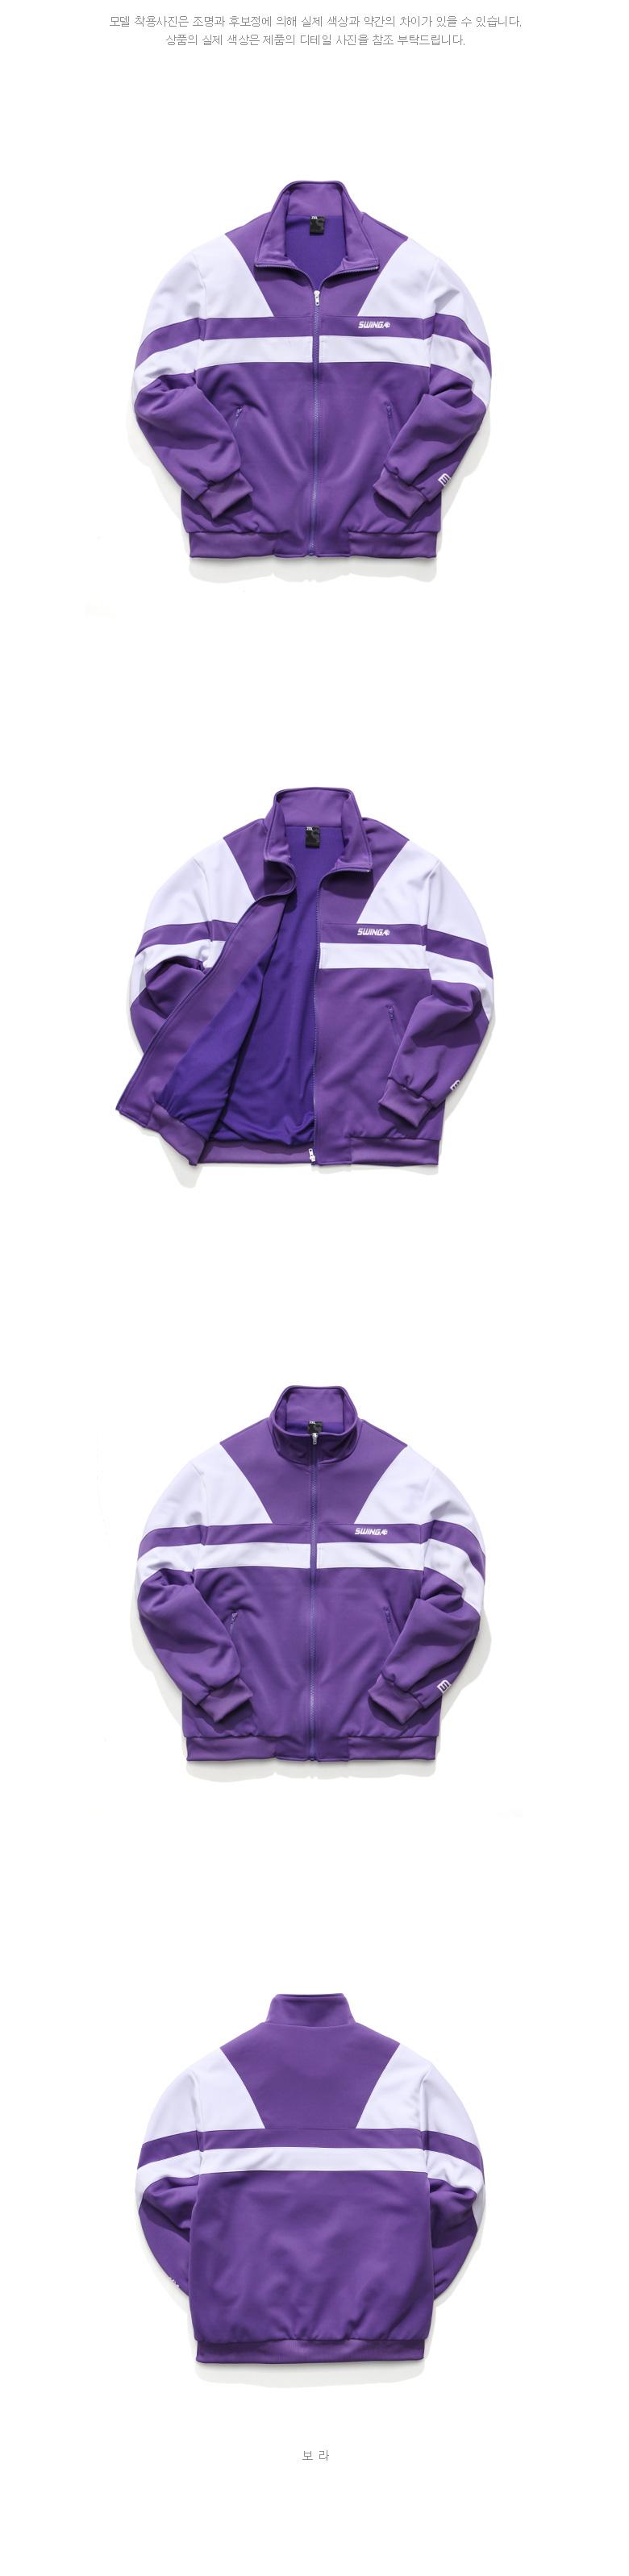 20180730_ps_swingwavetrack_purple_uk_01.jpg